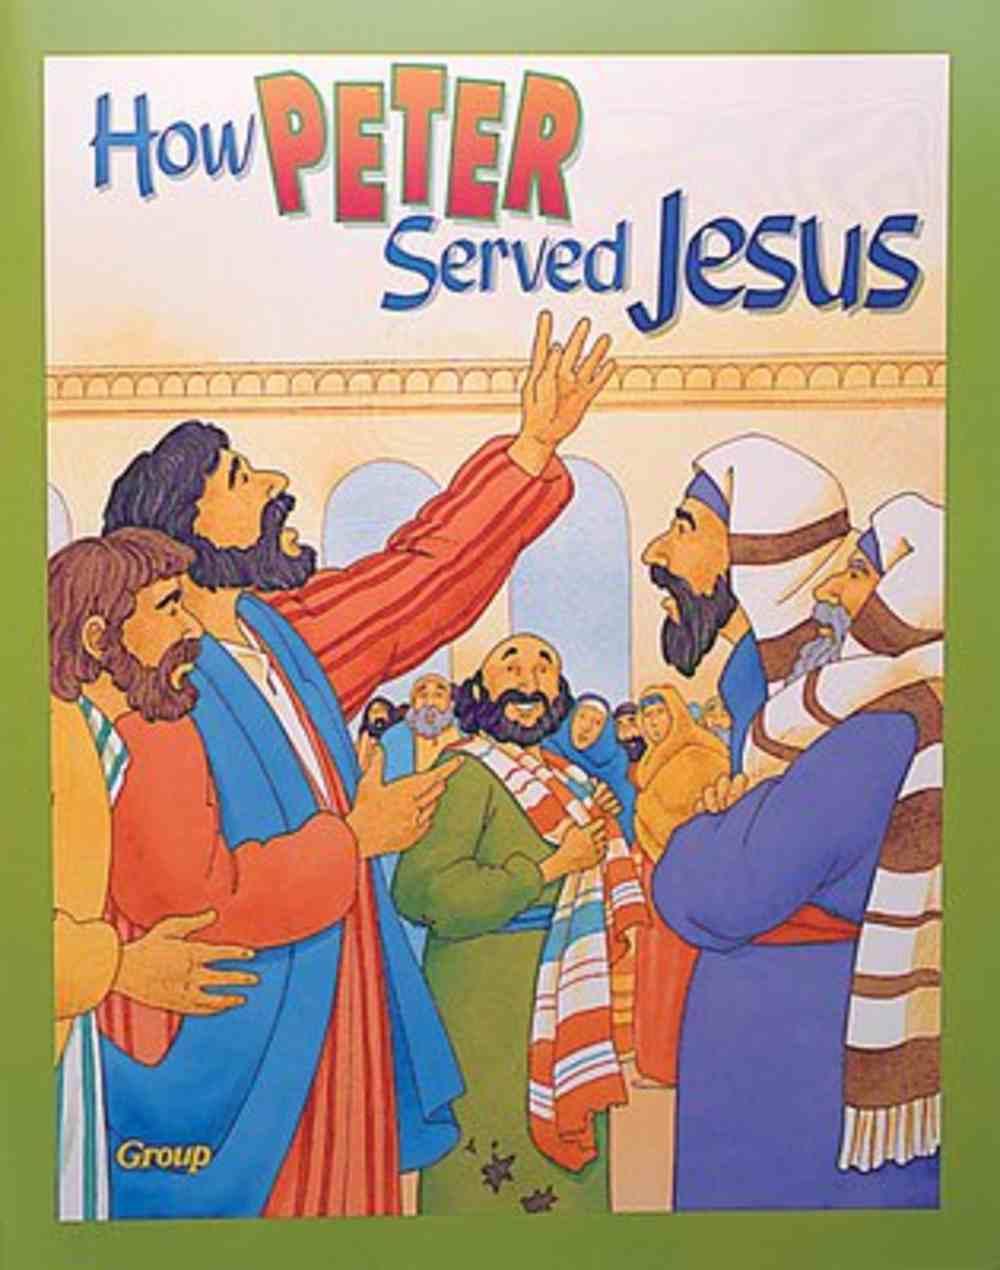 How Peter Served Jesus (Bible Big Book Series) Paperback